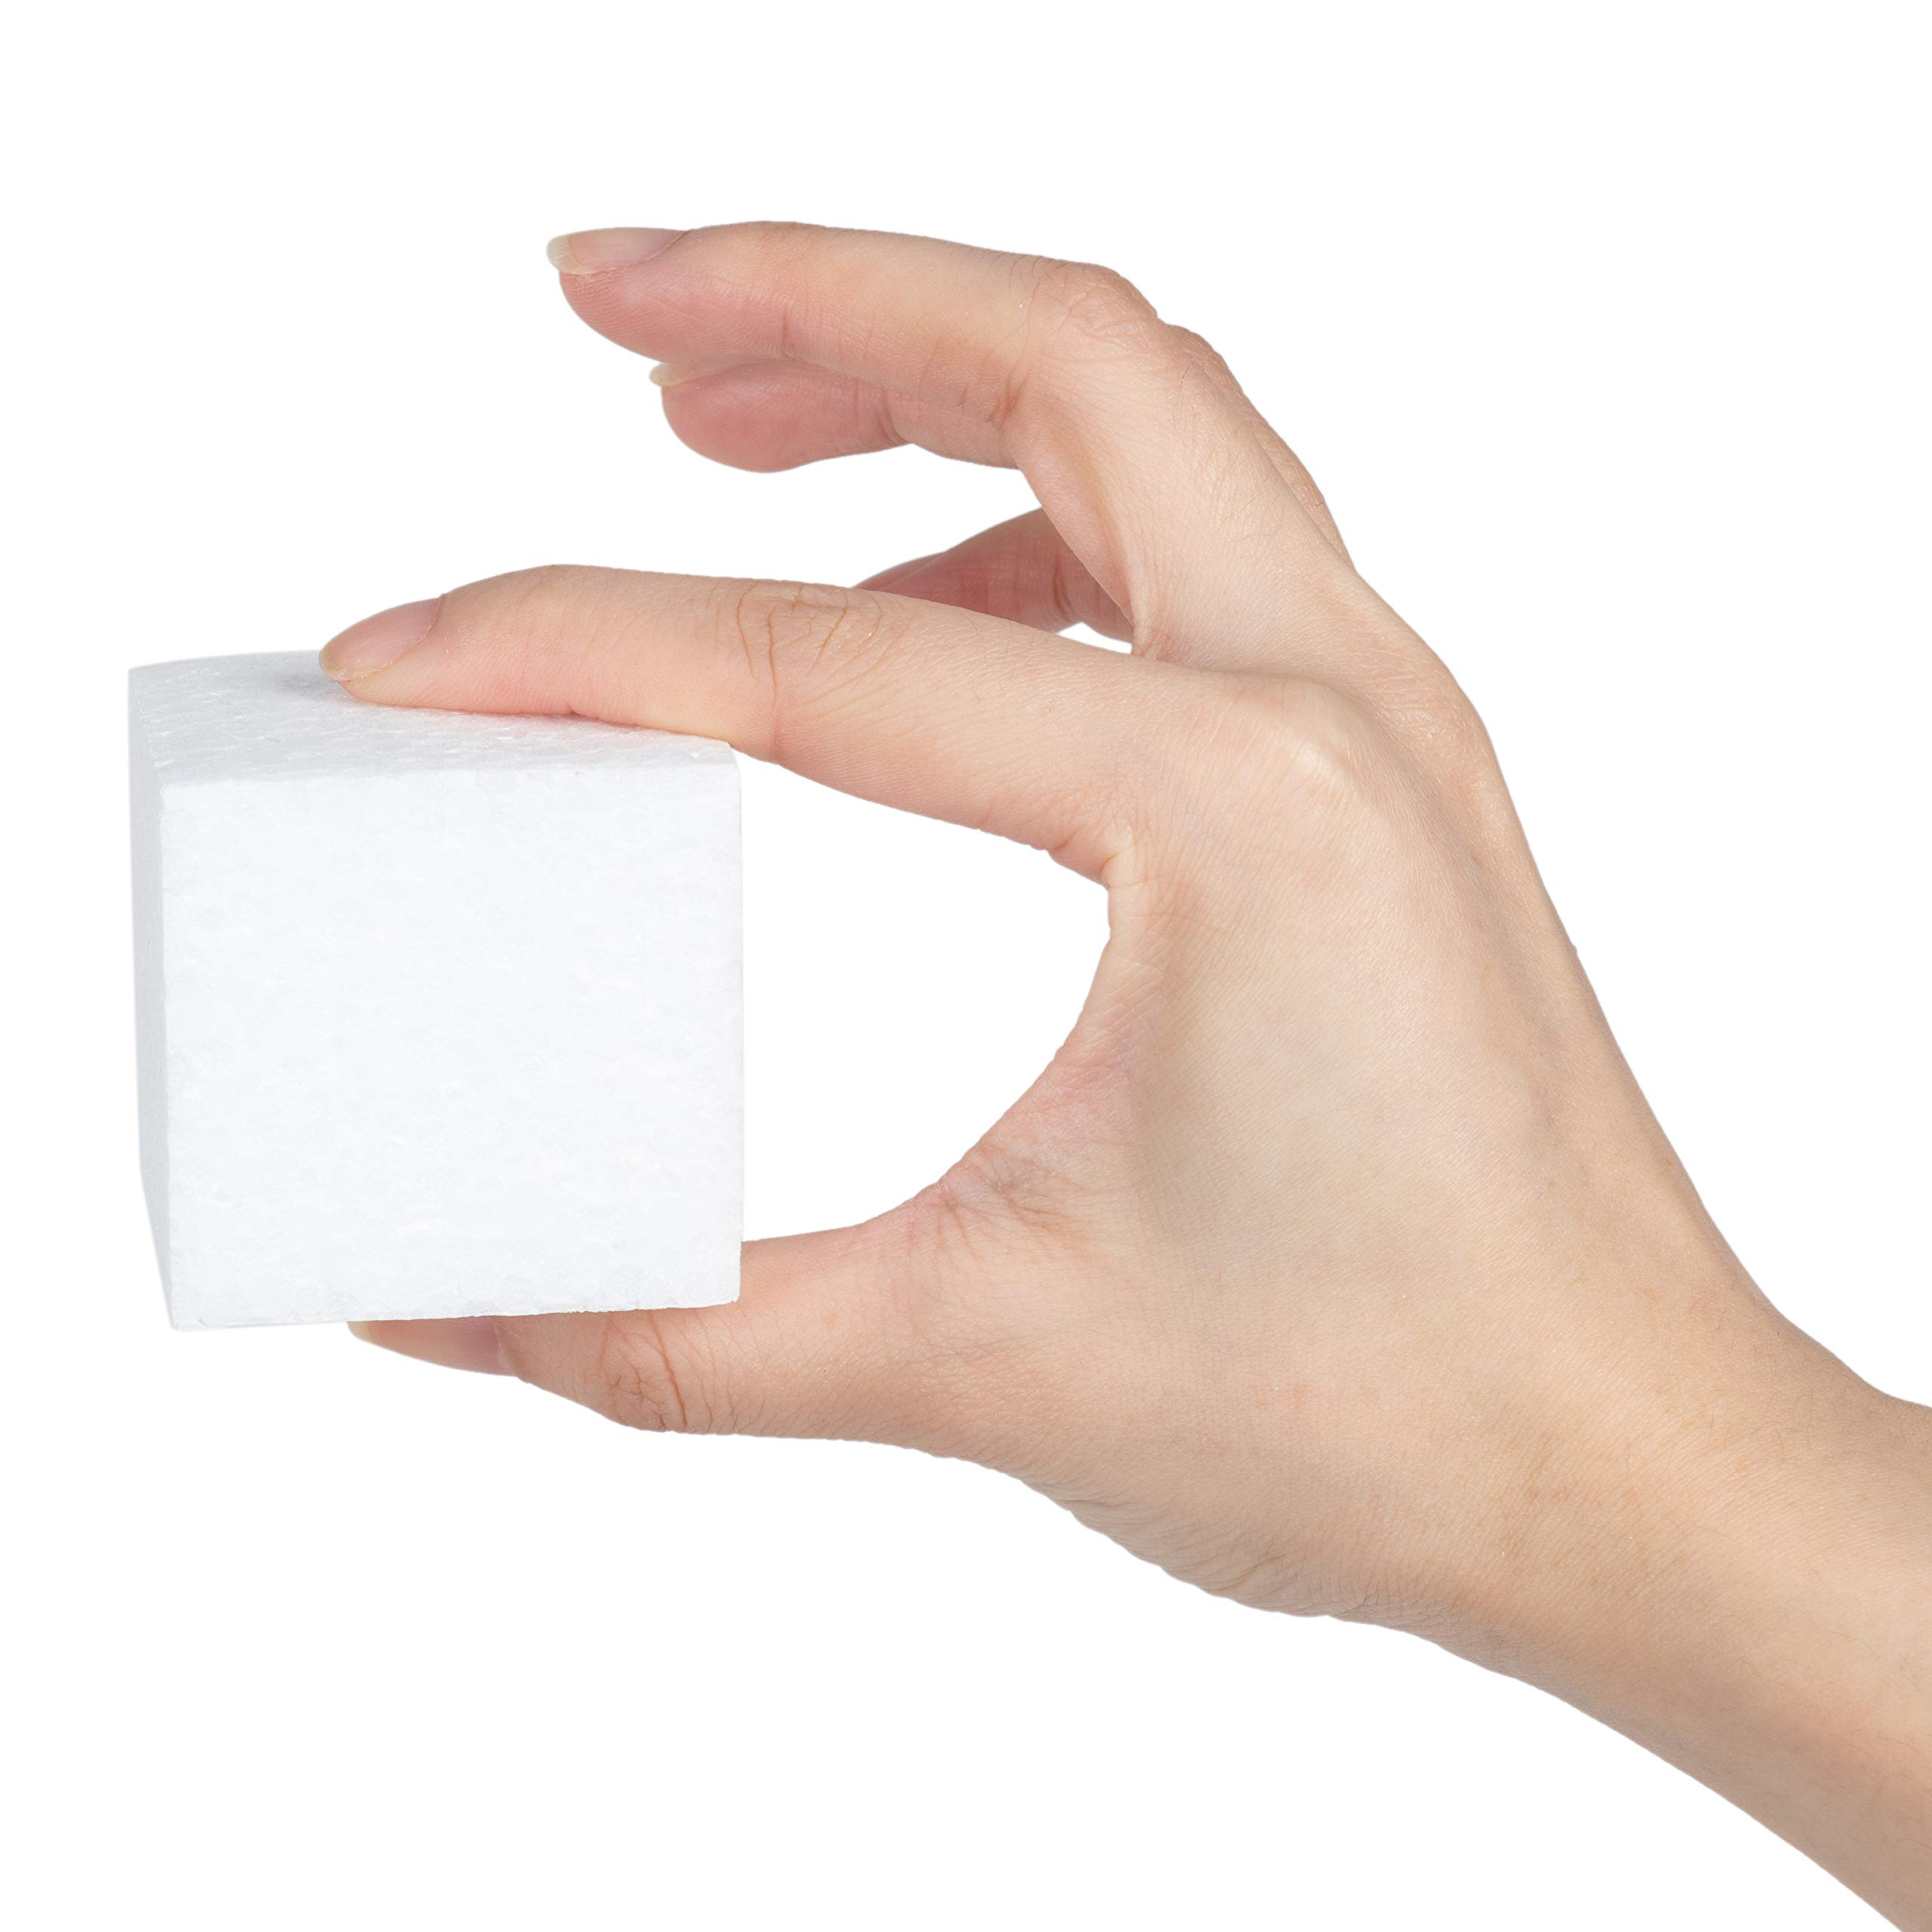 Craft Foam Blocks - 36-Piece Polystyrene Foam Blocks for Crafts and Modeling, 2 x 2 x 2 Inches Blank Craft Foam by Genie Crafts (Image #5)